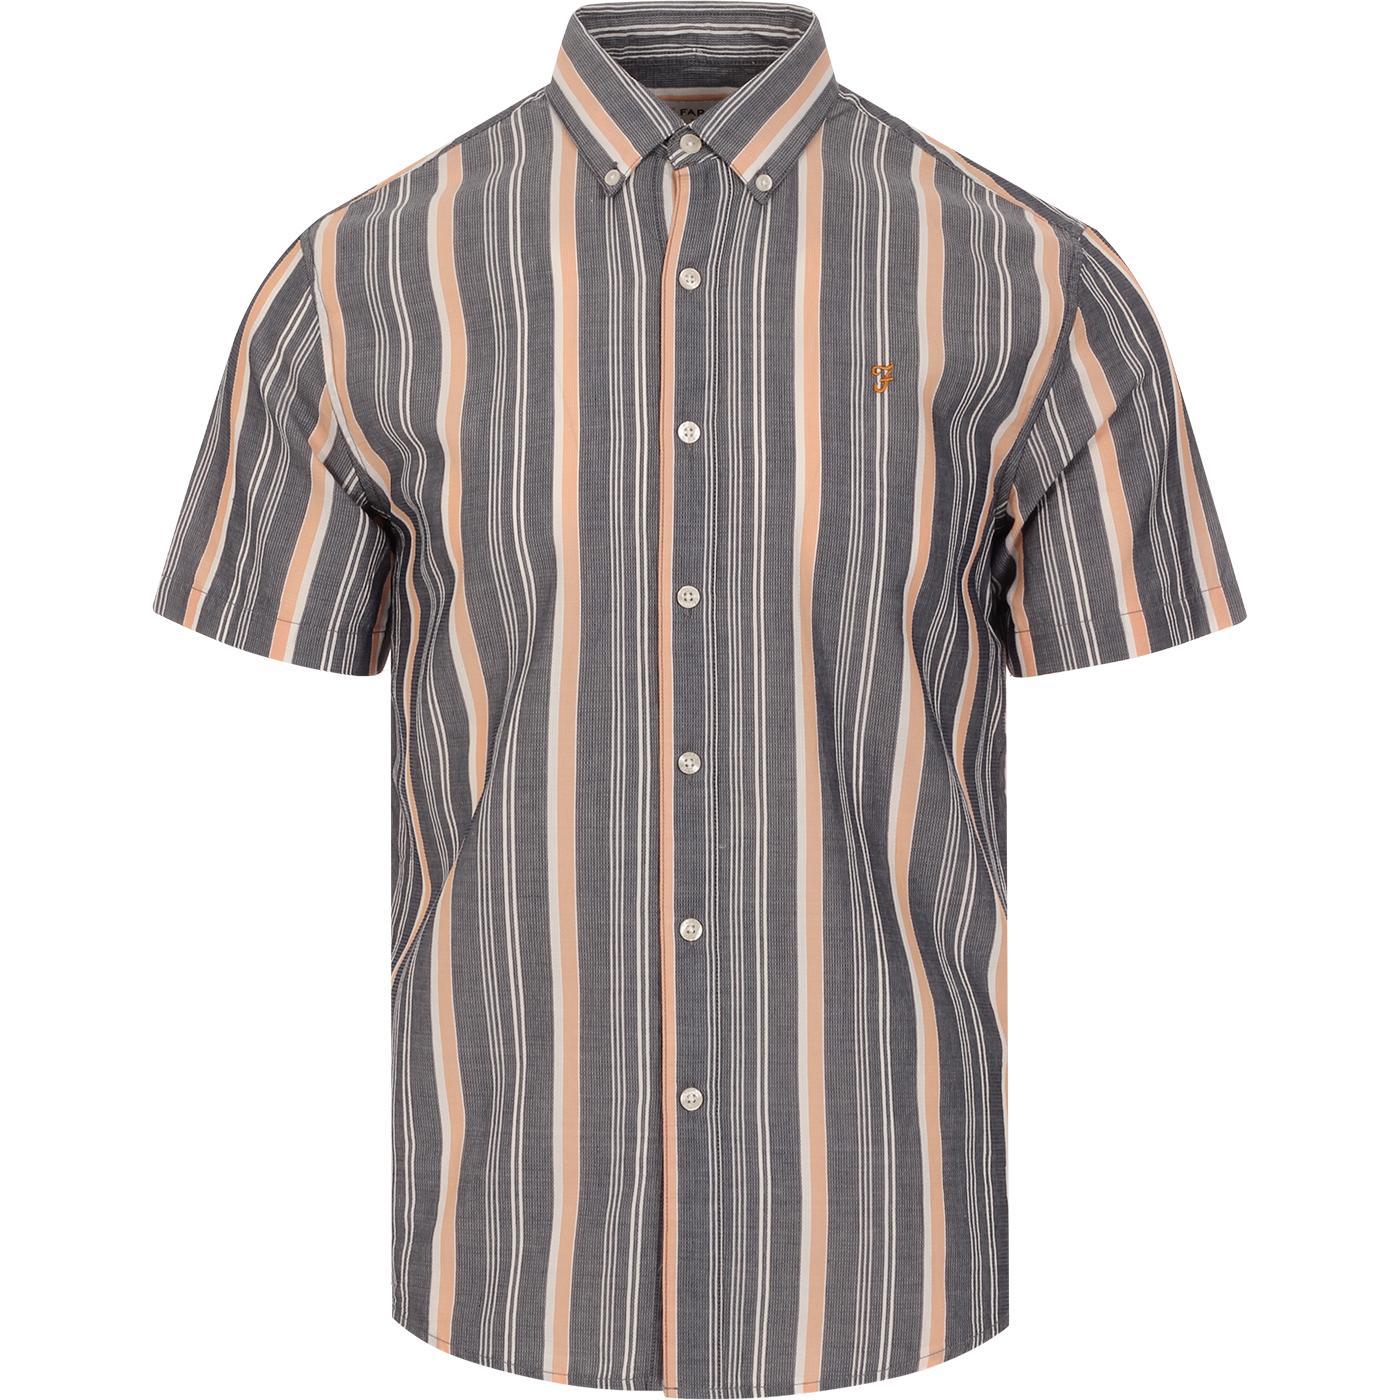 Robertson FARAH Retro Mod Textured Stripe SS Shirt